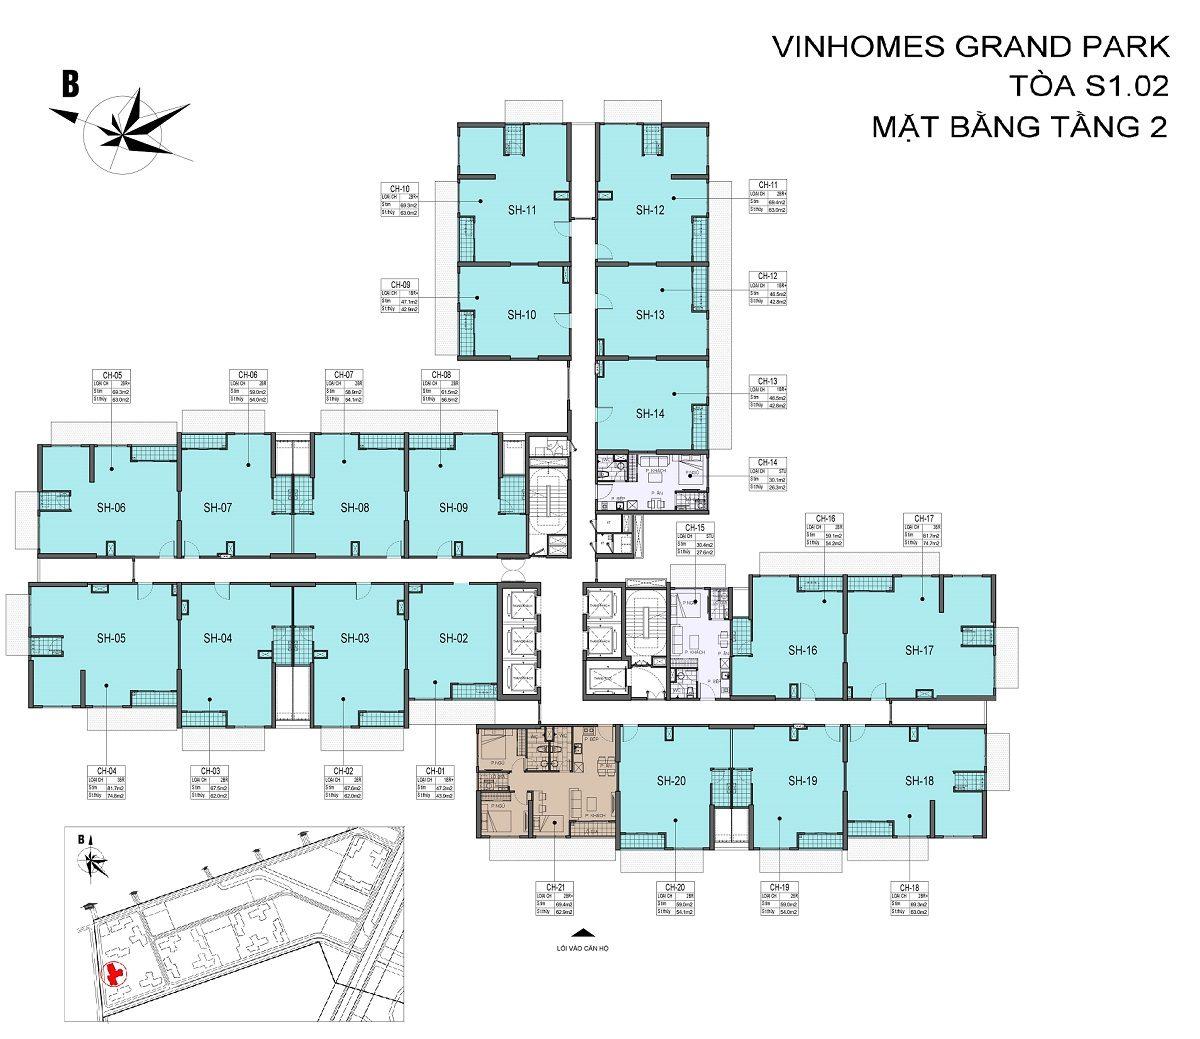 shophouse vinhomes grand park s1. 02